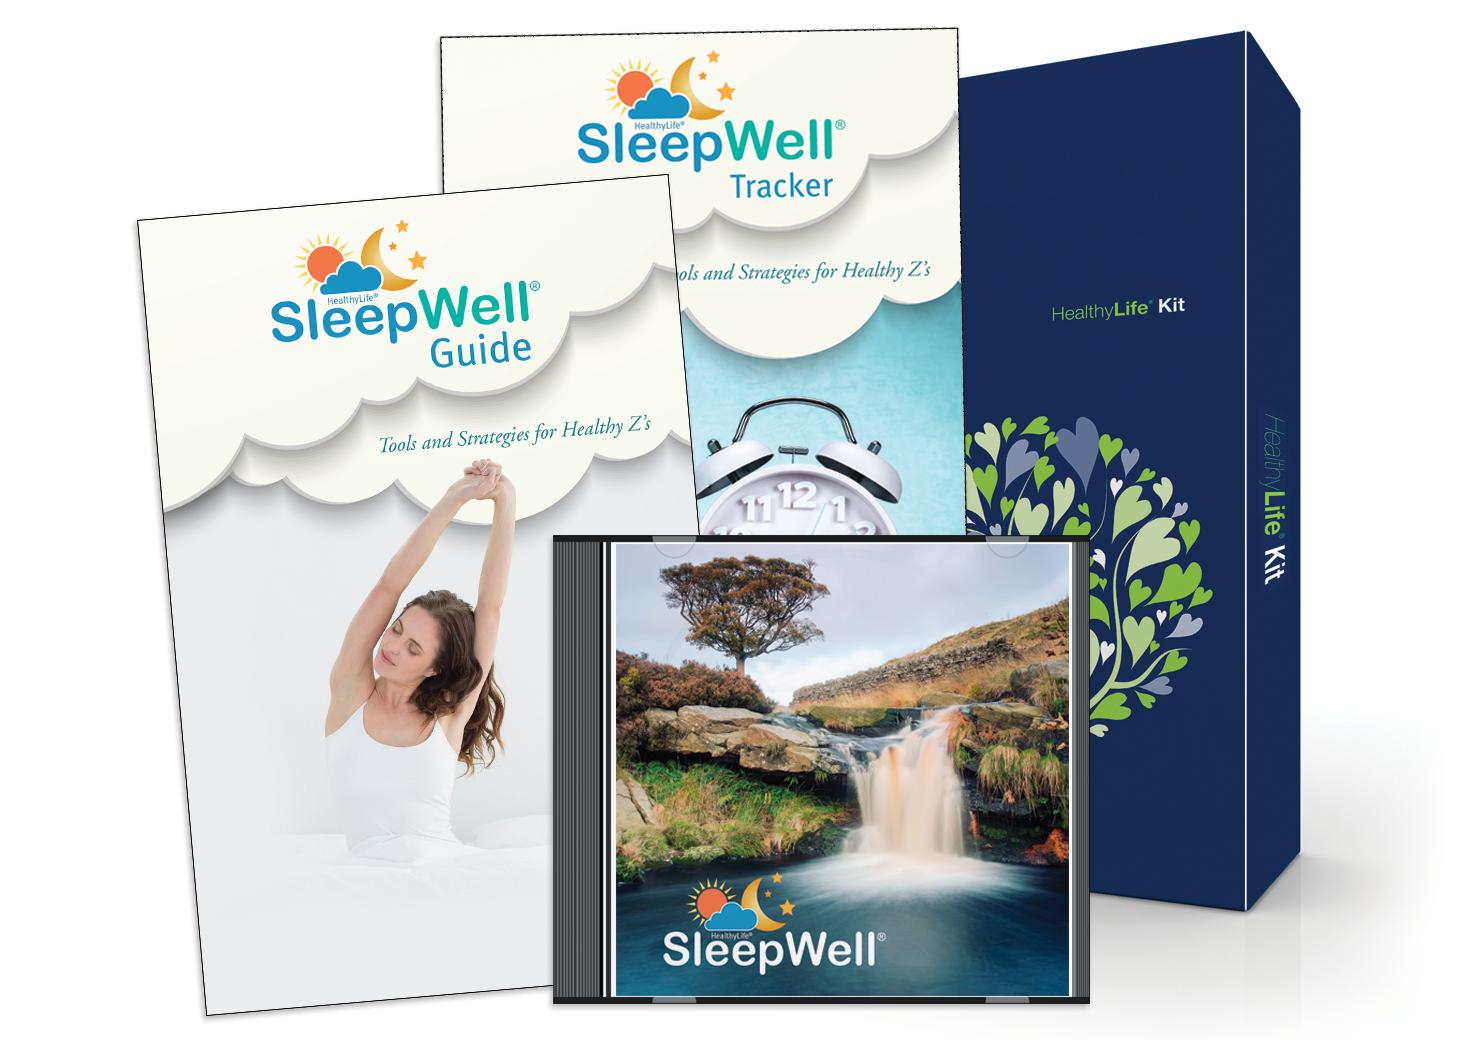 AIPM HealthyLife SleepWell Kit